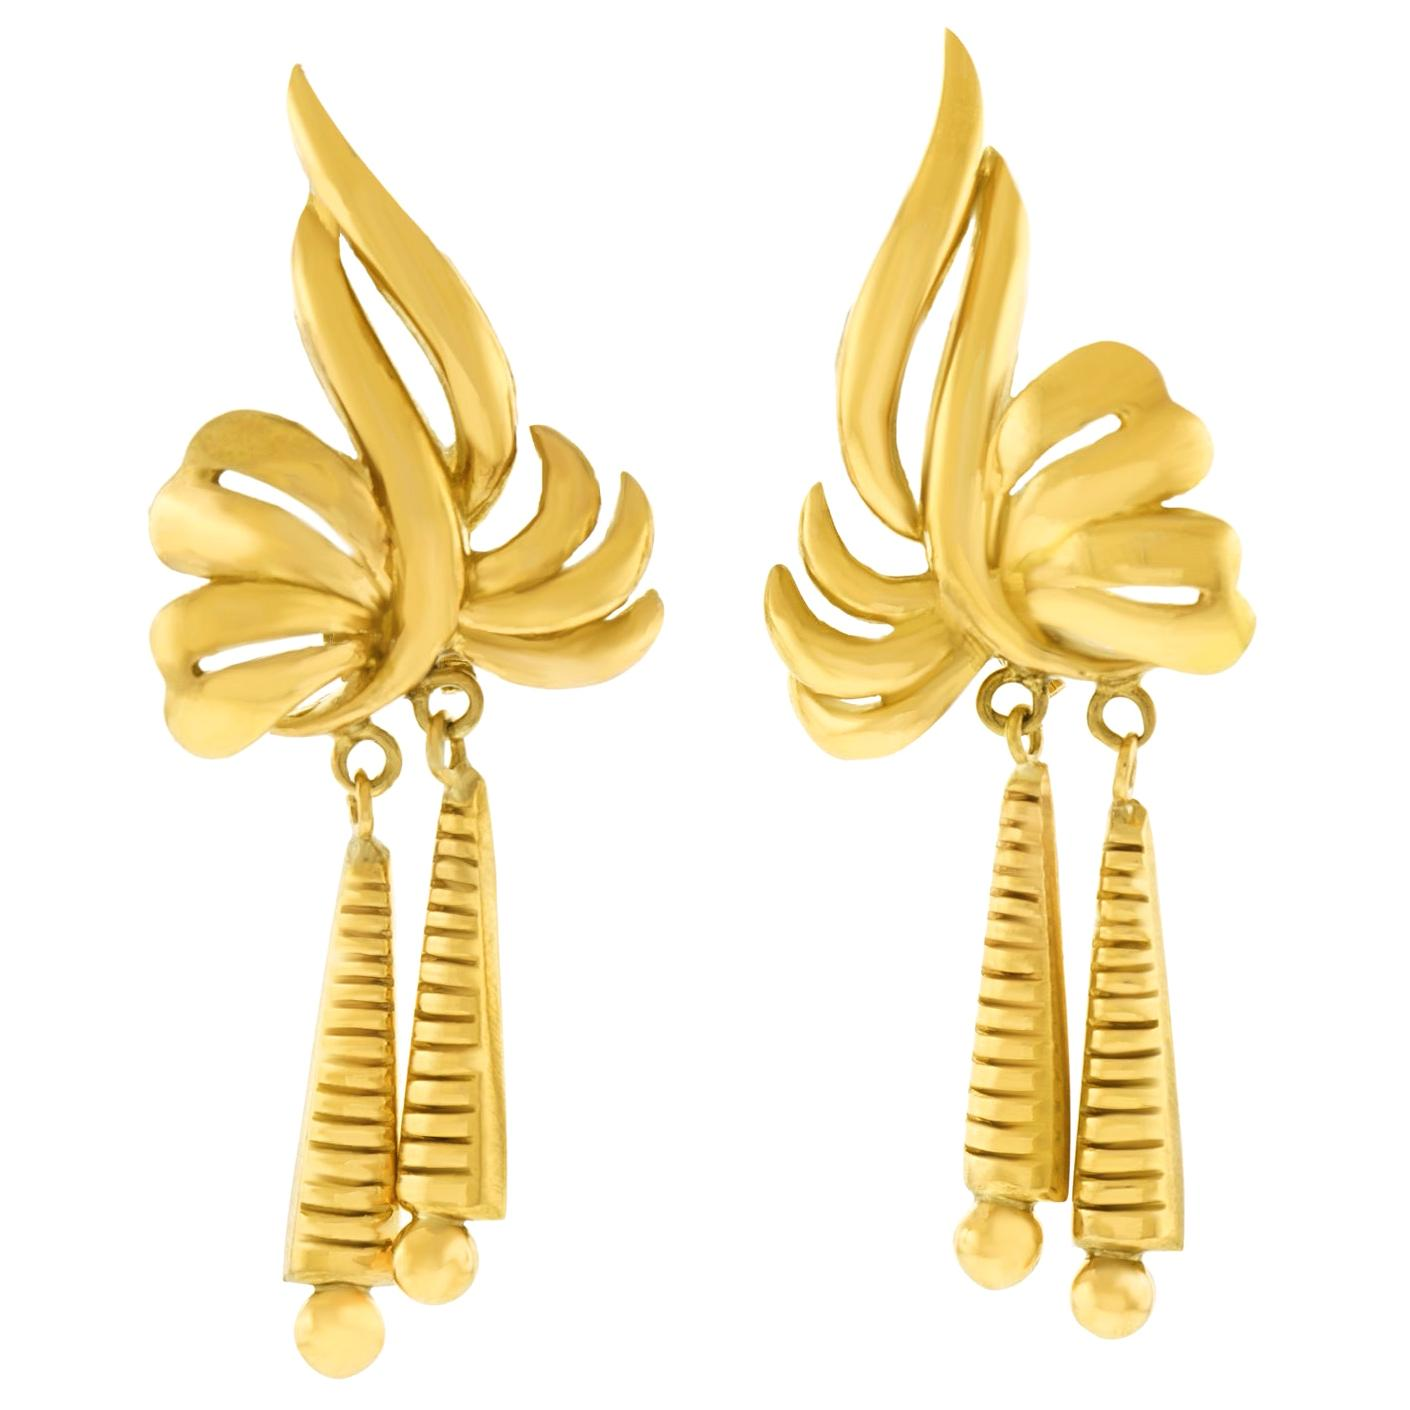 Chic Retro 1960s Gold Earrings